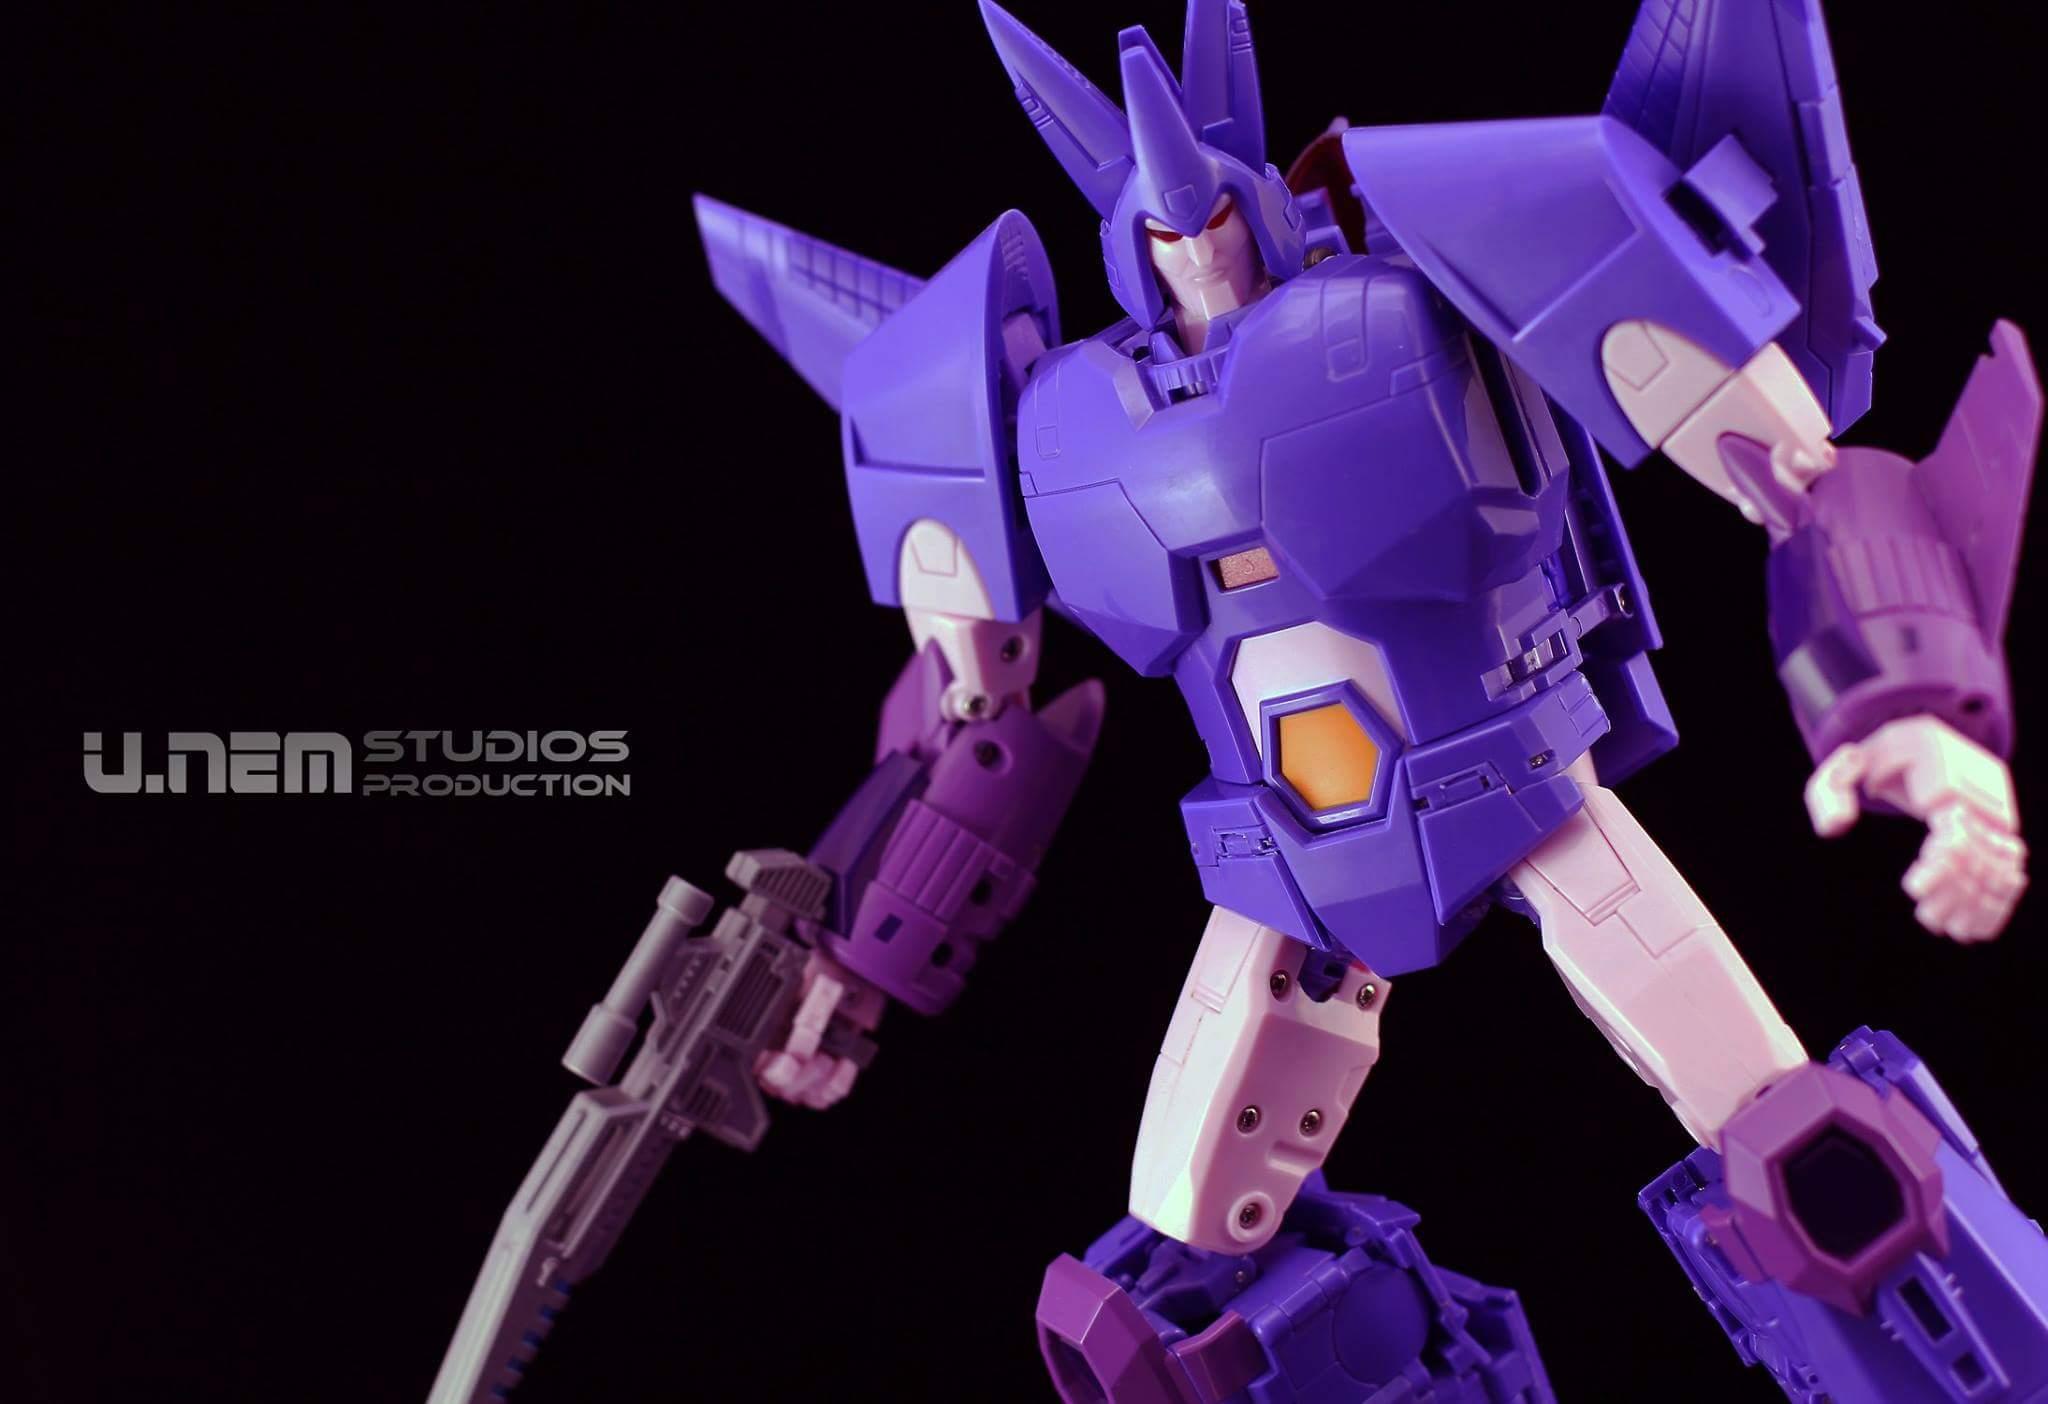 [X-Transbots] Produit Tiers - MX-III Eligos - aka Cyclonus - Page 3 S86kTQ0B